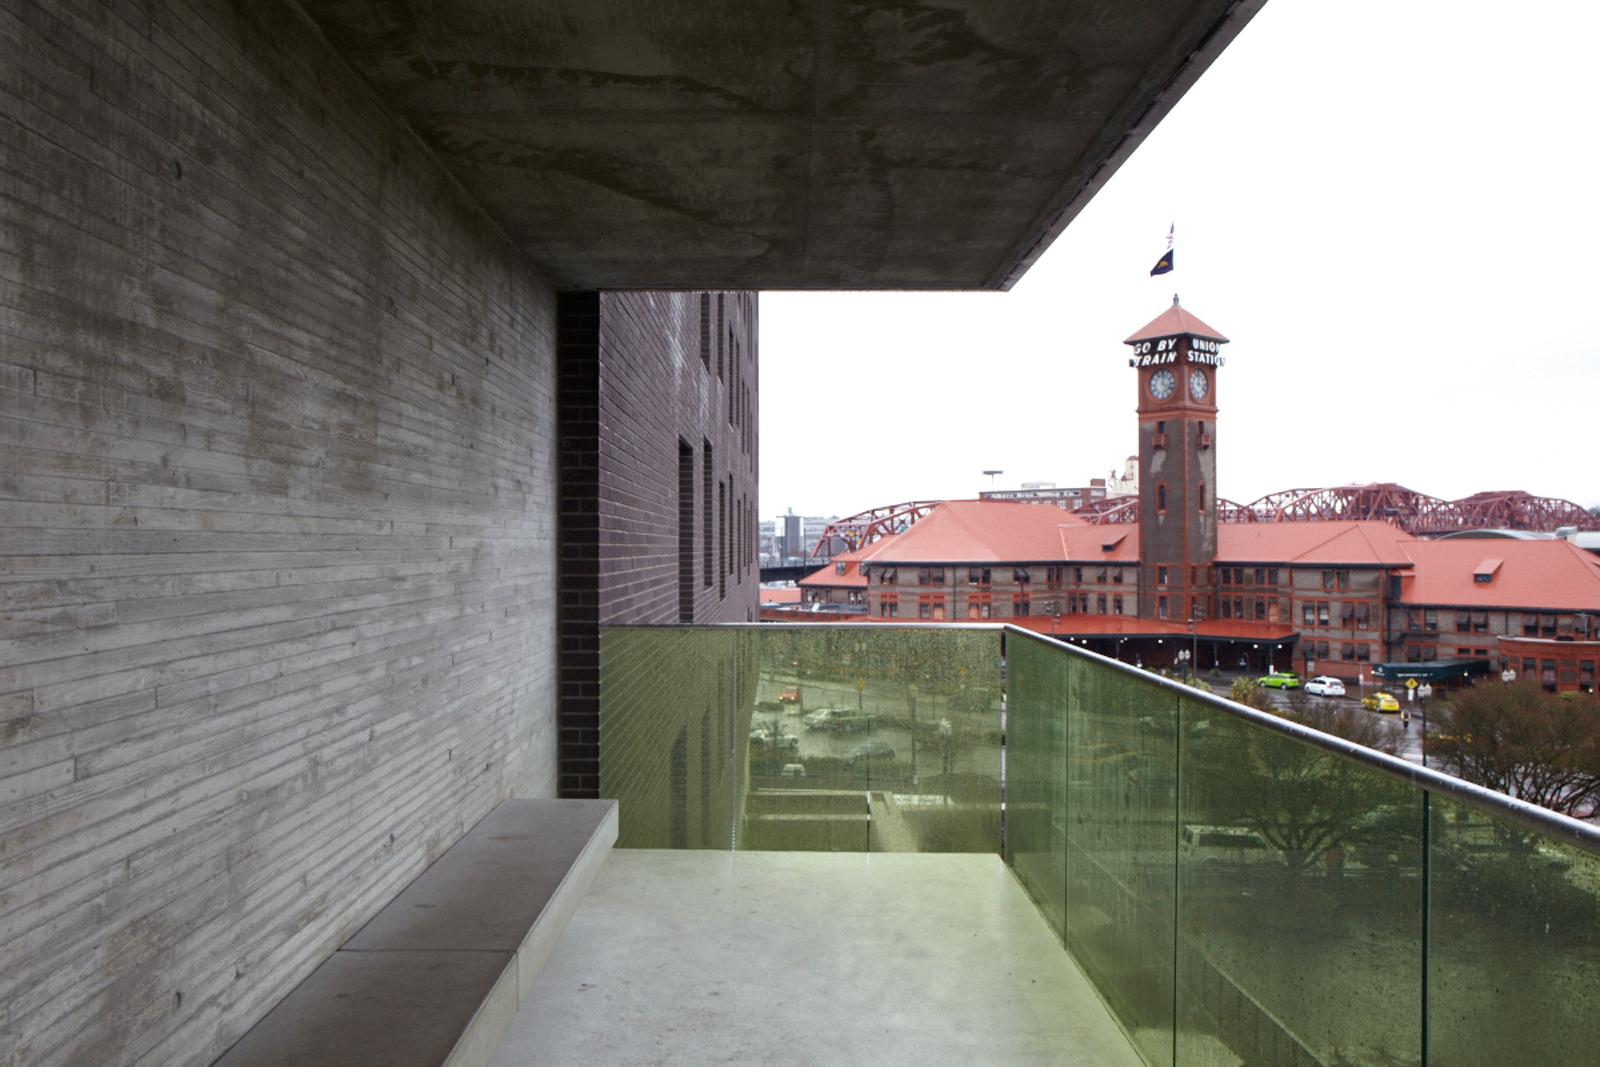 Concrete balcony of Bud Clark Commons in Portland, Oregon